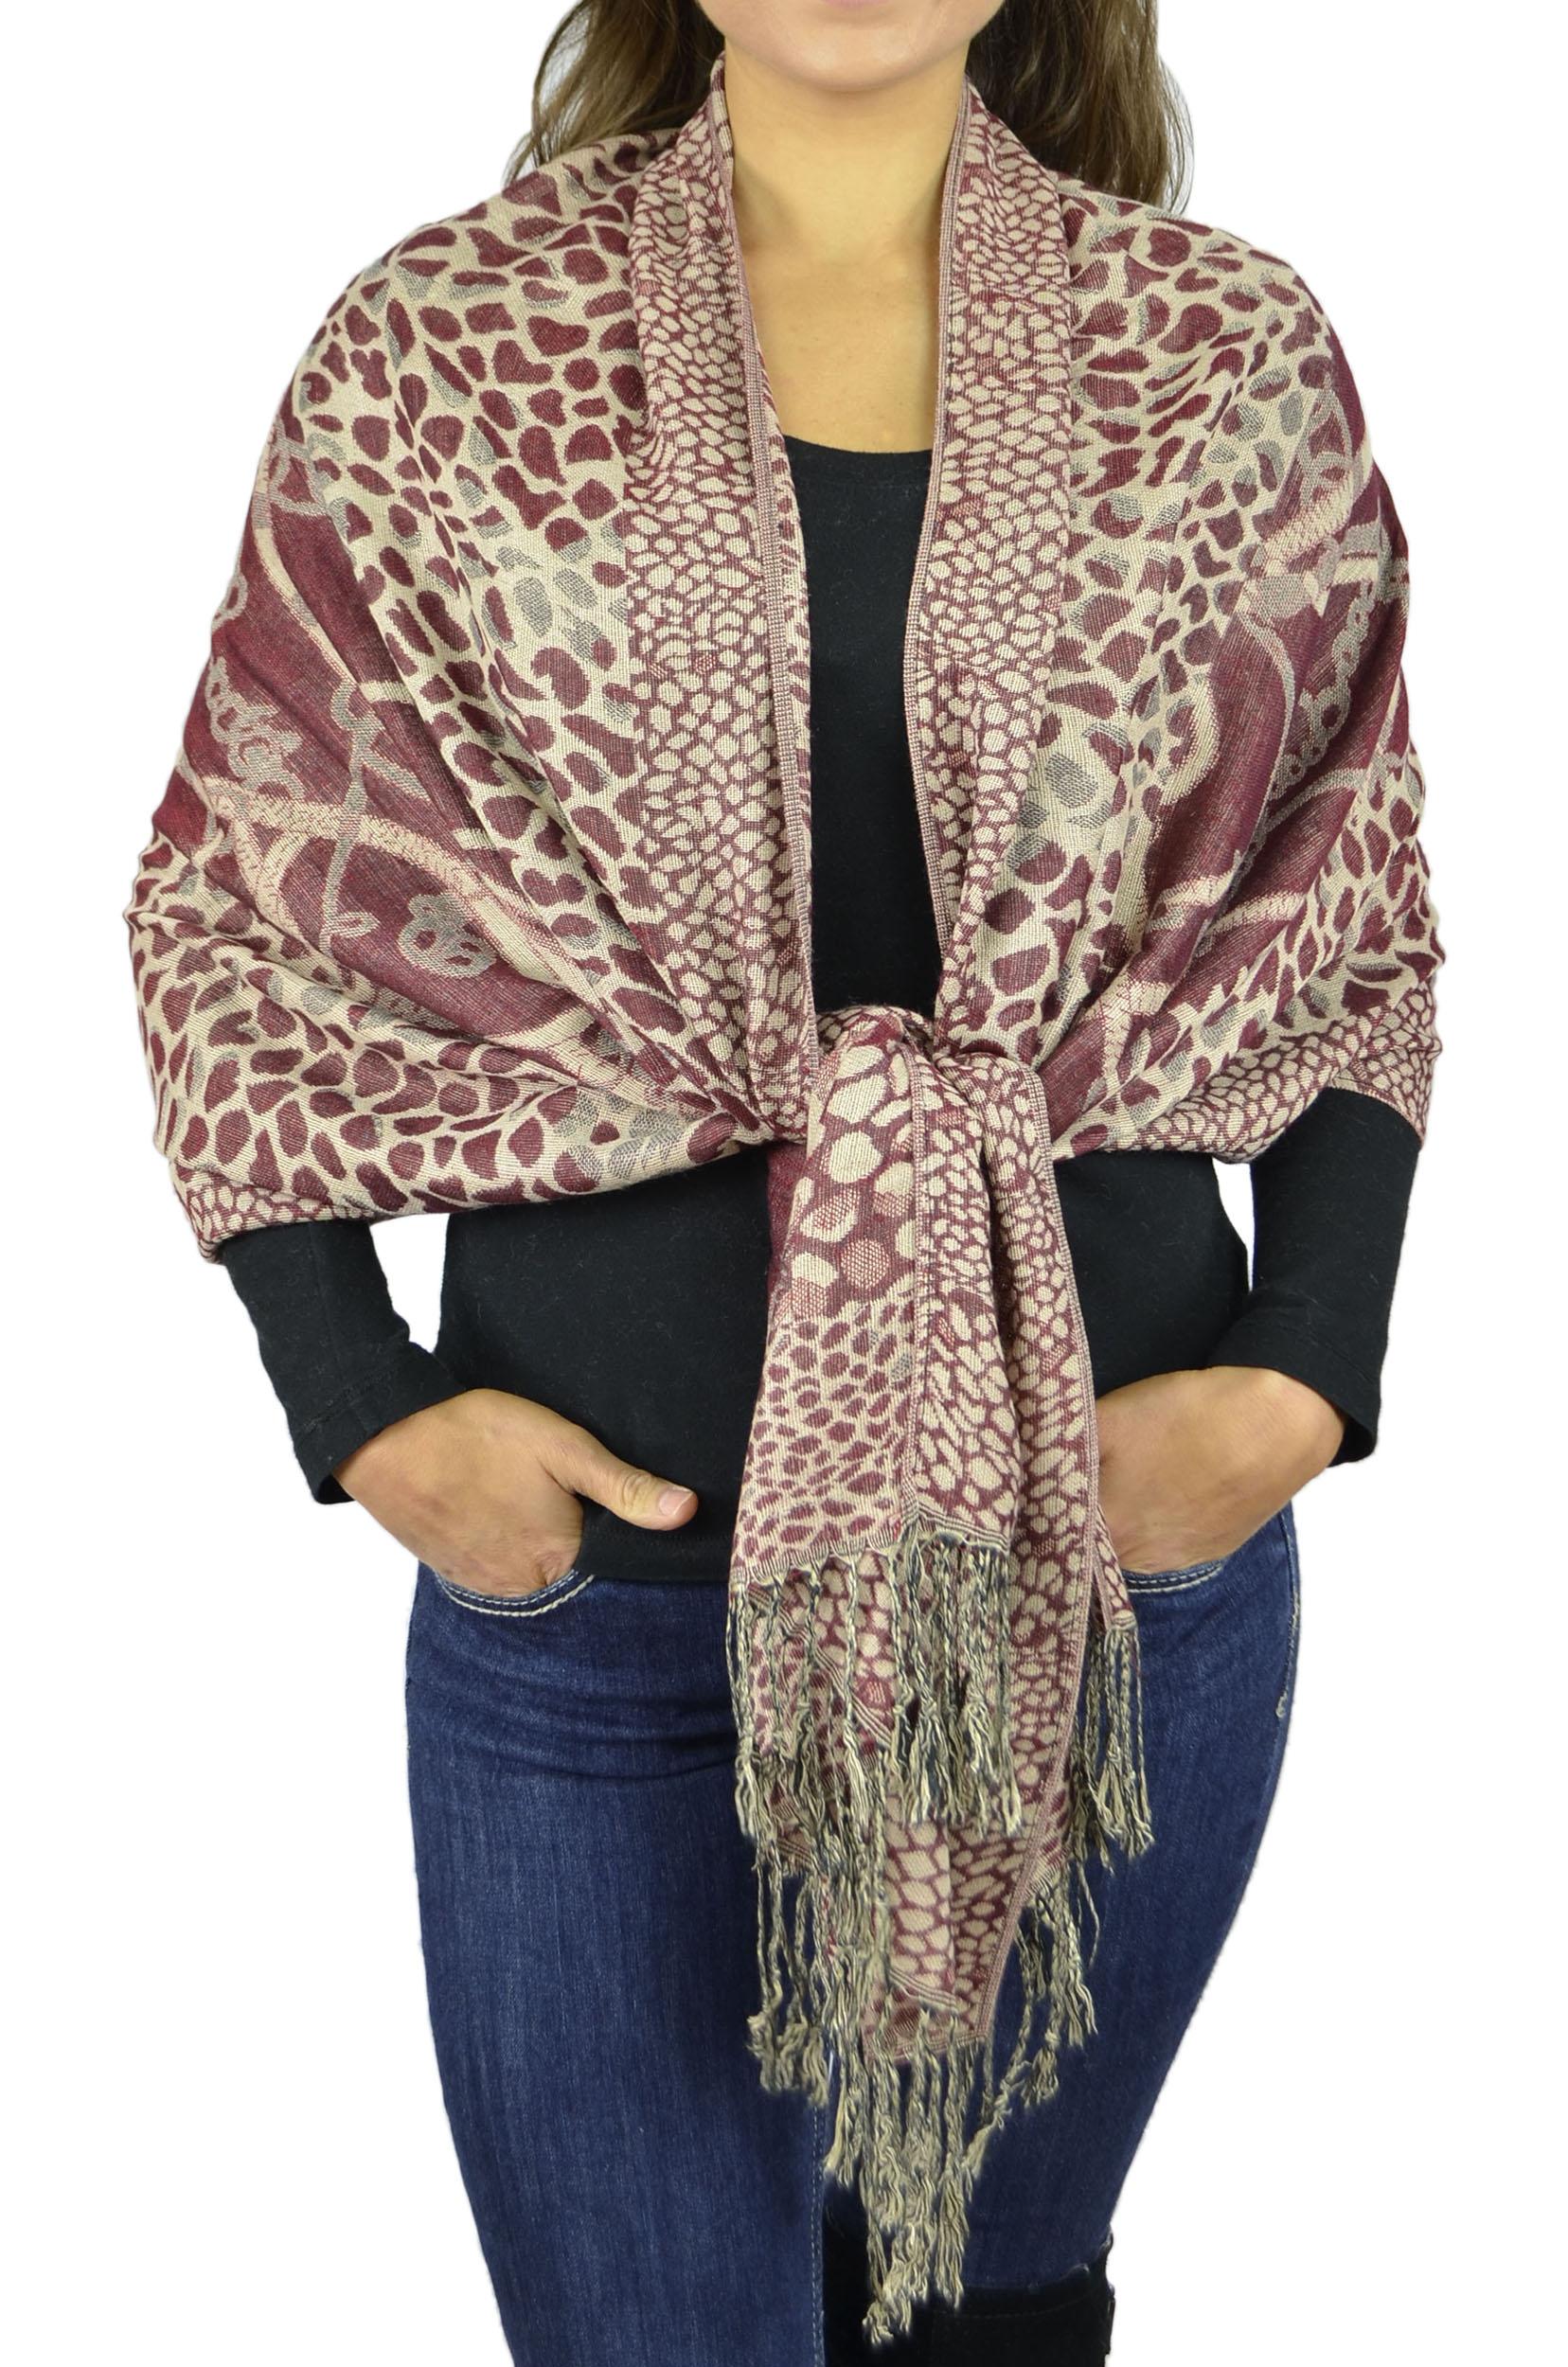 Pashmina Women Soft Wrap Shawl Animal Print Scarf By Belle Donne - Maroon